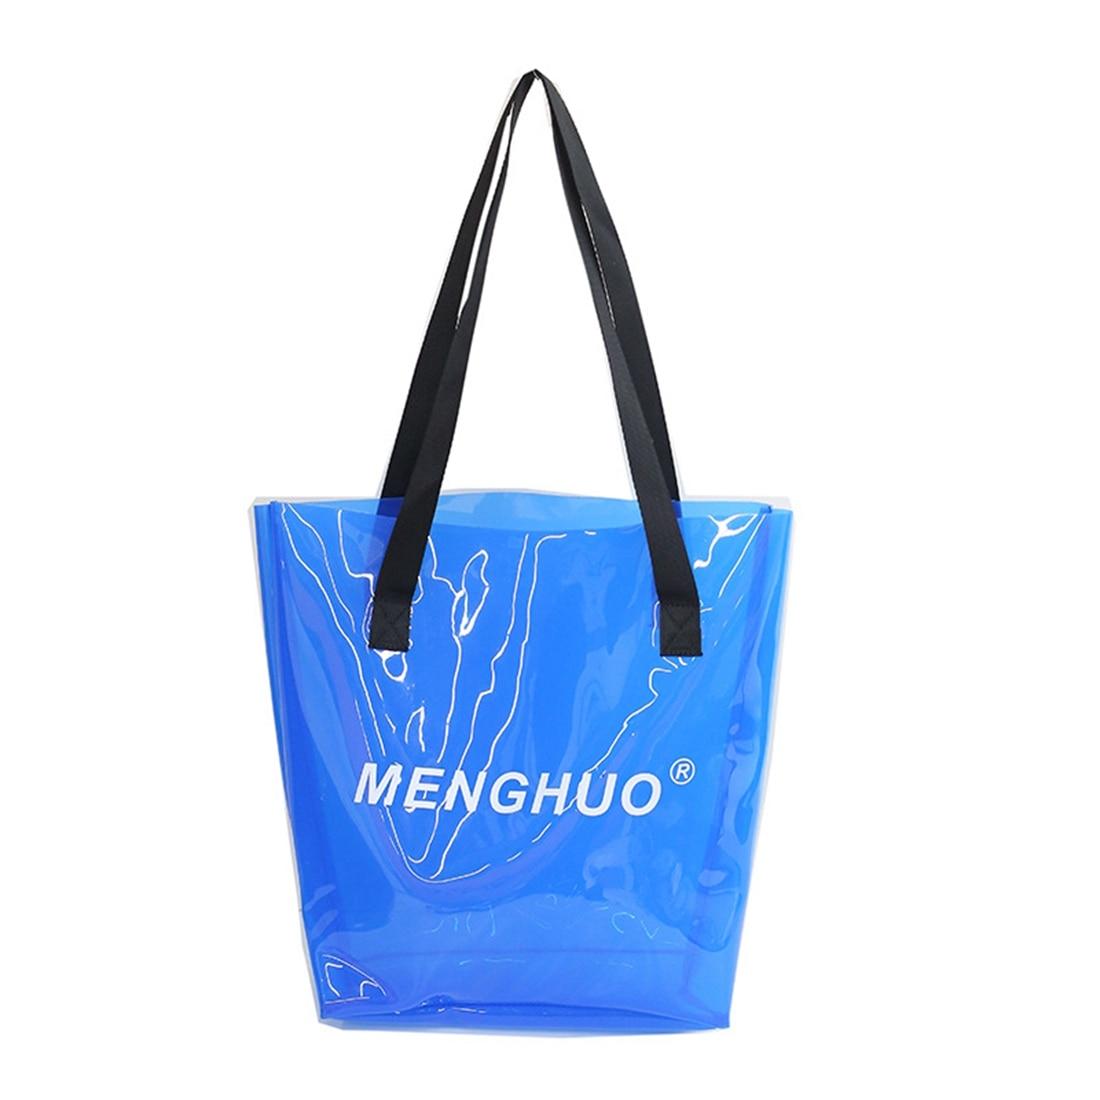 "DCOS 2018 Fashion New PVC Transparent Letter ""MENGHUO"" Jelly Bag Waterproof Hand Shoulder Beach Handbag"